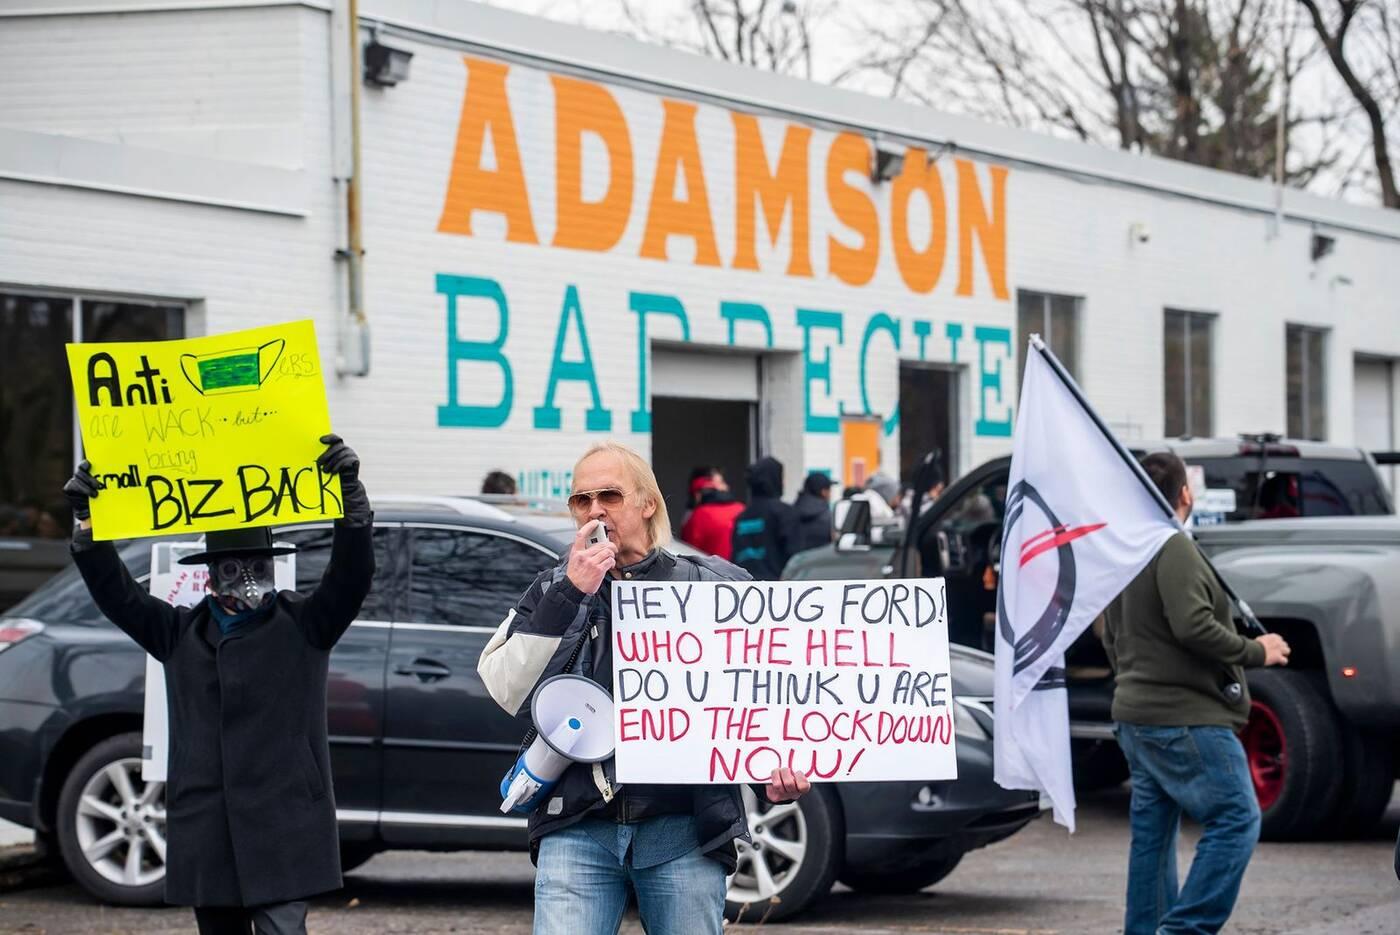 adamson bbq etobicoke